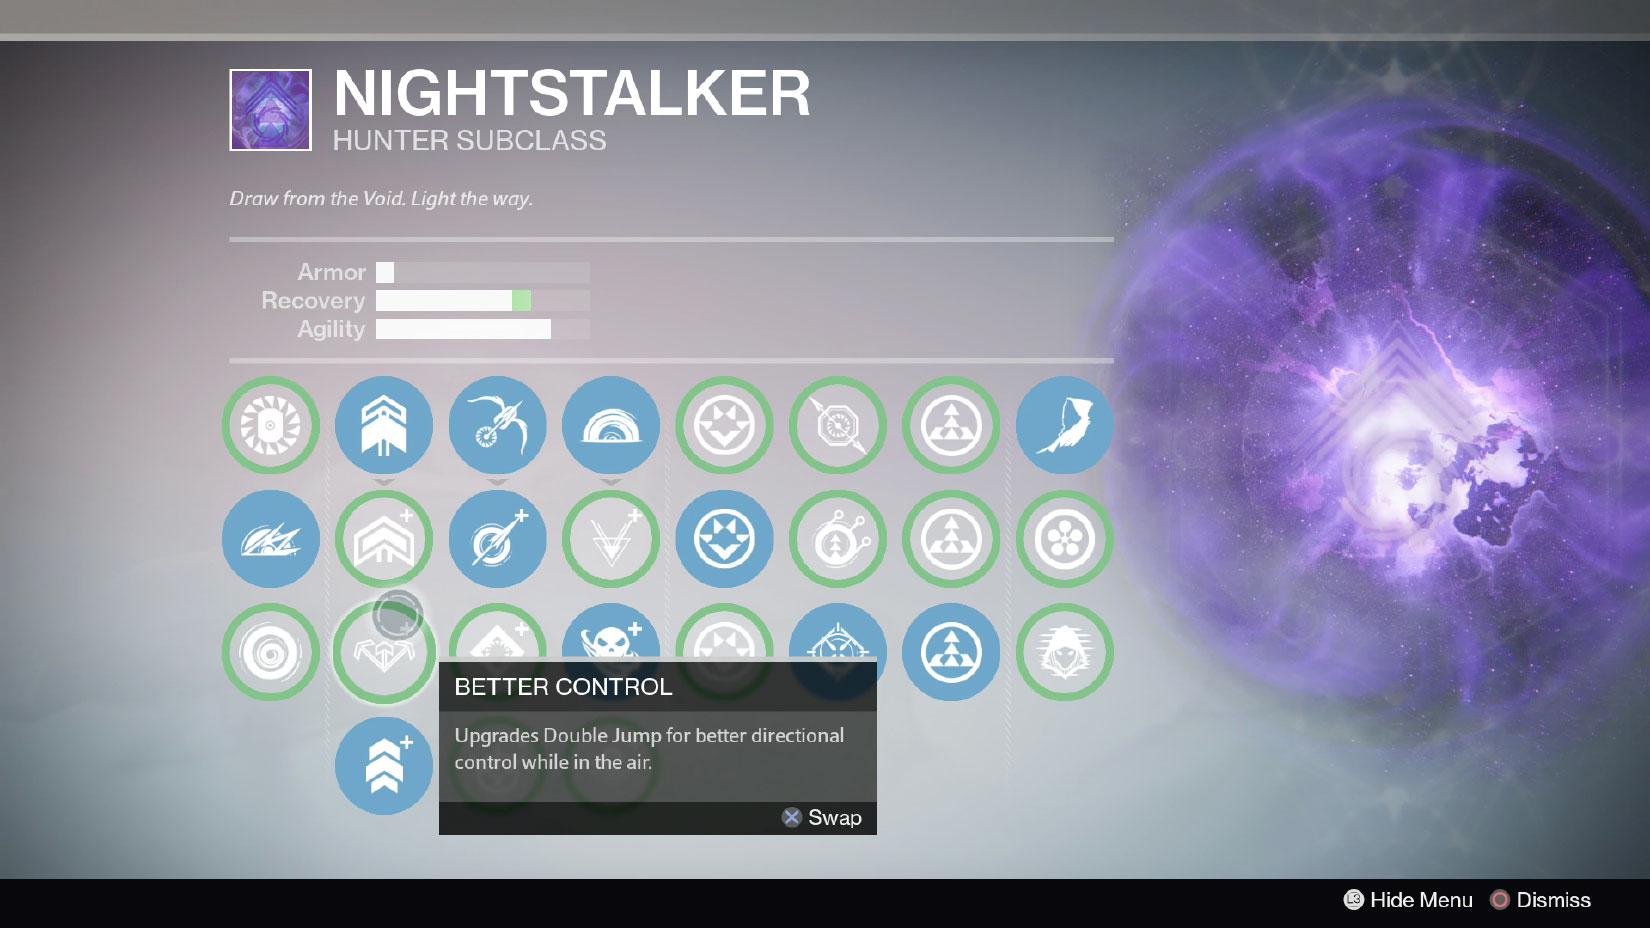 nightstalker_subclass_the_taken_king